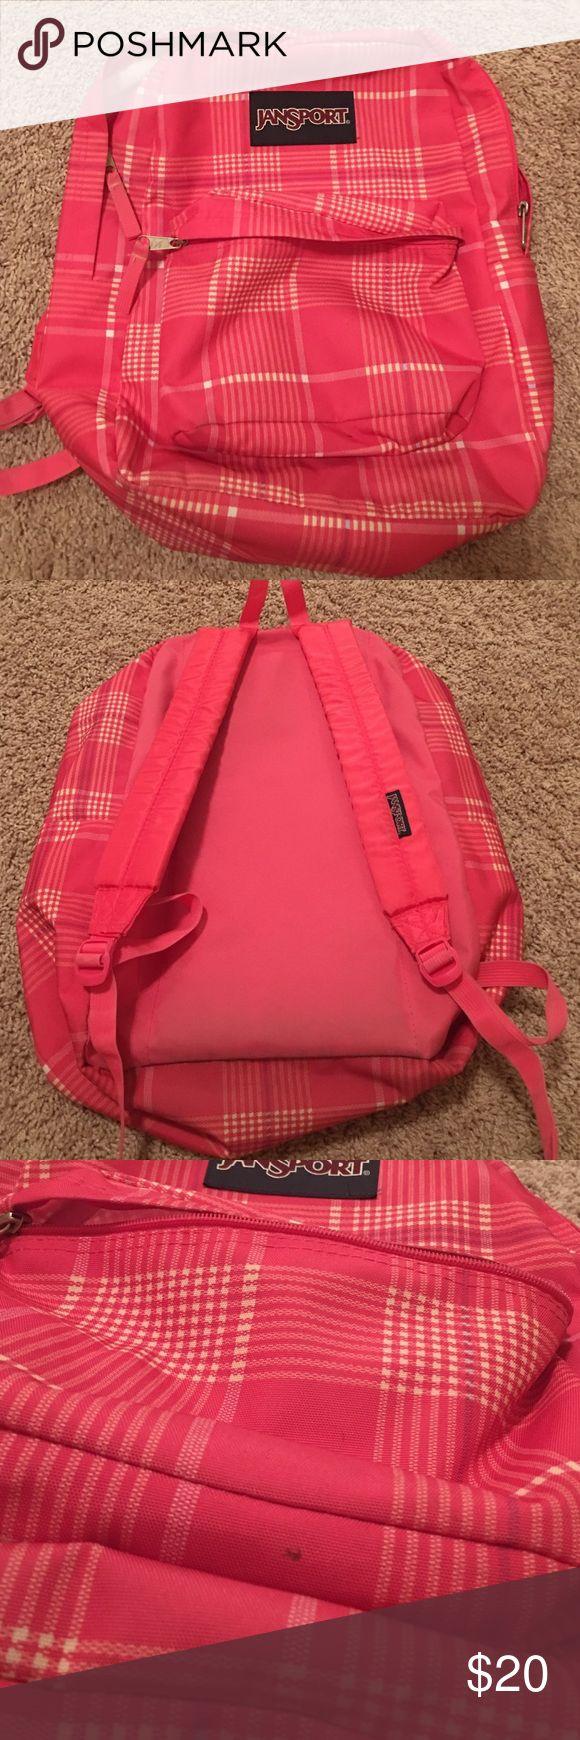 Jansport Backpack Pink jansport backpack. Minor spots (pictured above) and general wear and tear/ discoloration Jansport Bags Backpacks